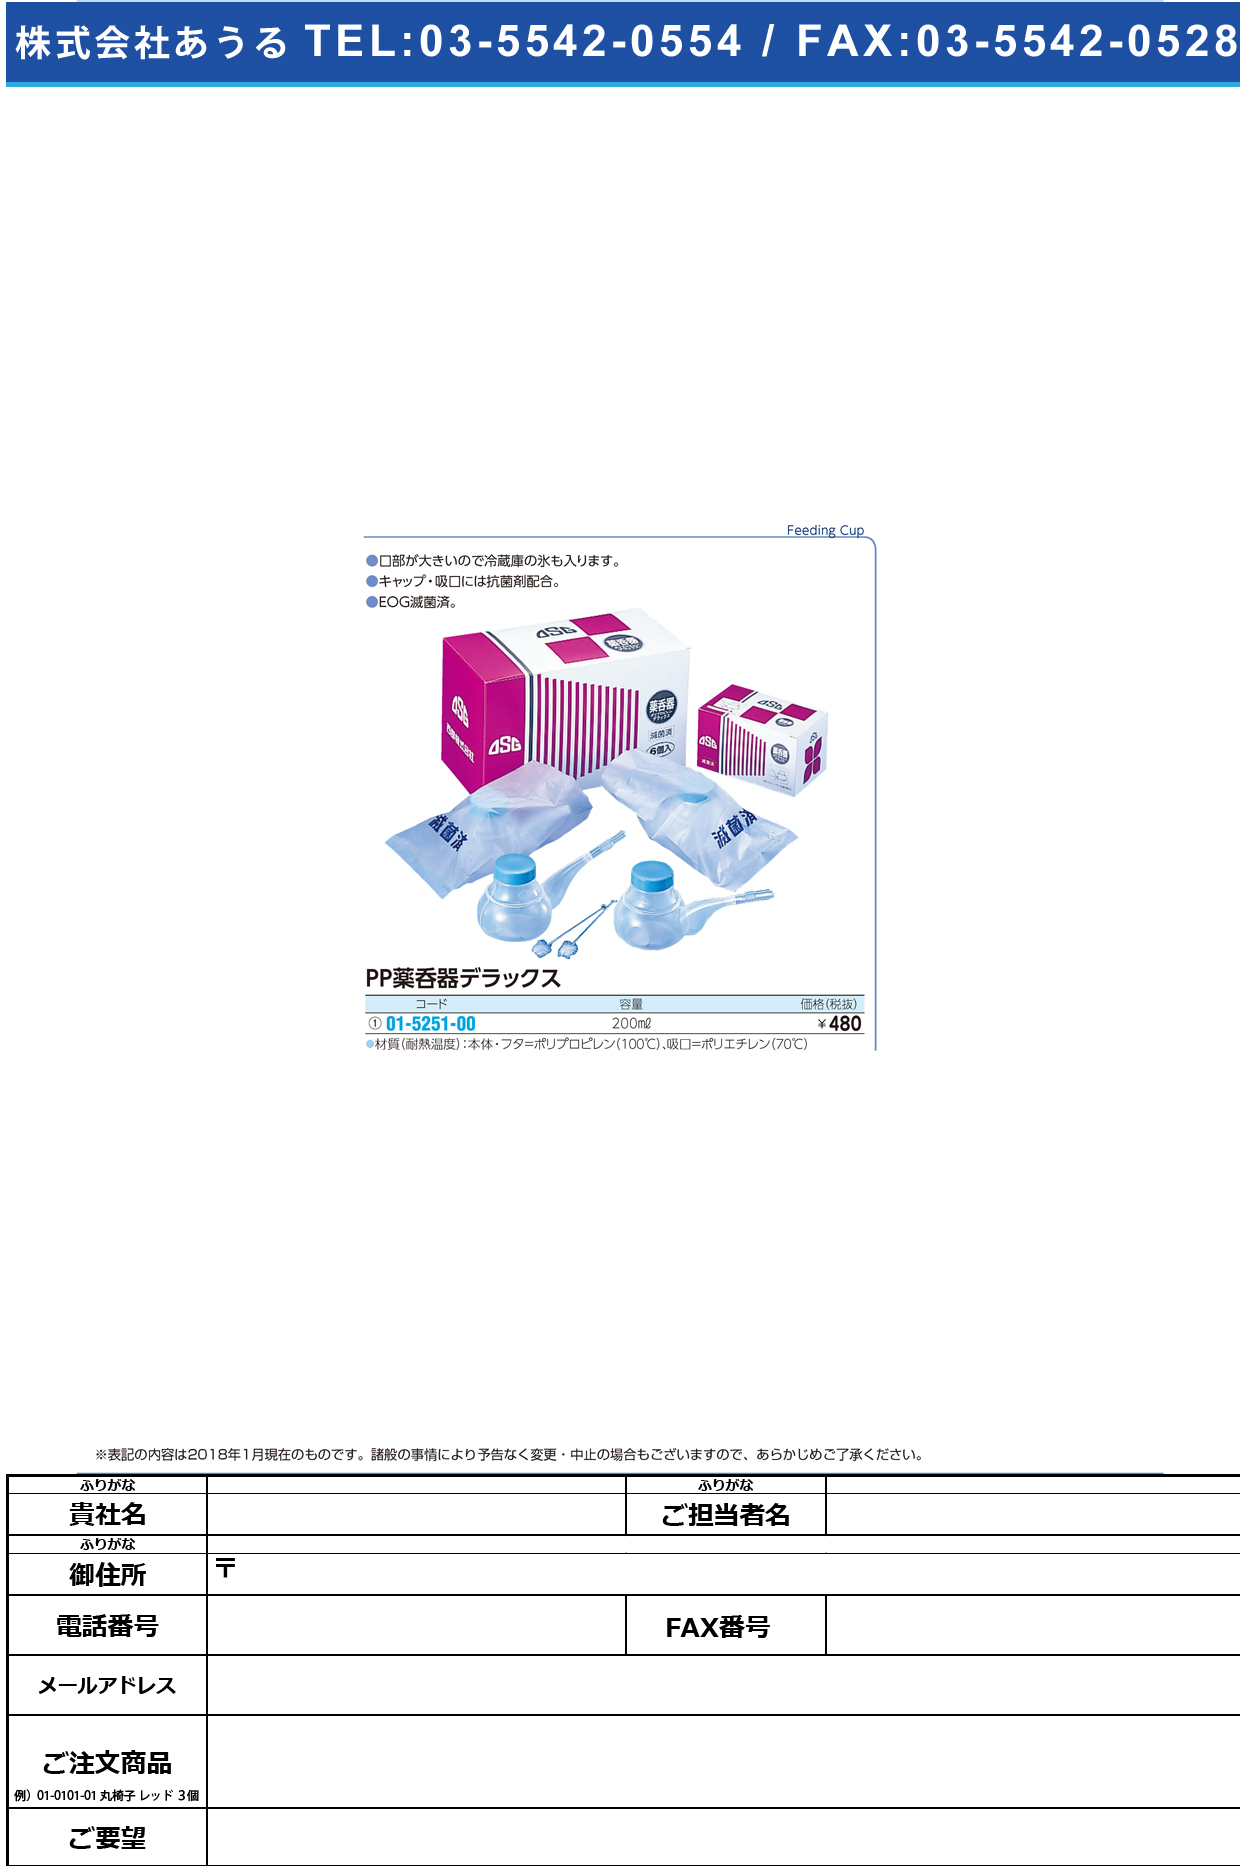 (01-5251-00)OSGPP薬呑器デラックス 200ML(メッキンズミ) PPヤクノミキデラックス【1個単位】【2018年カタログ商品】